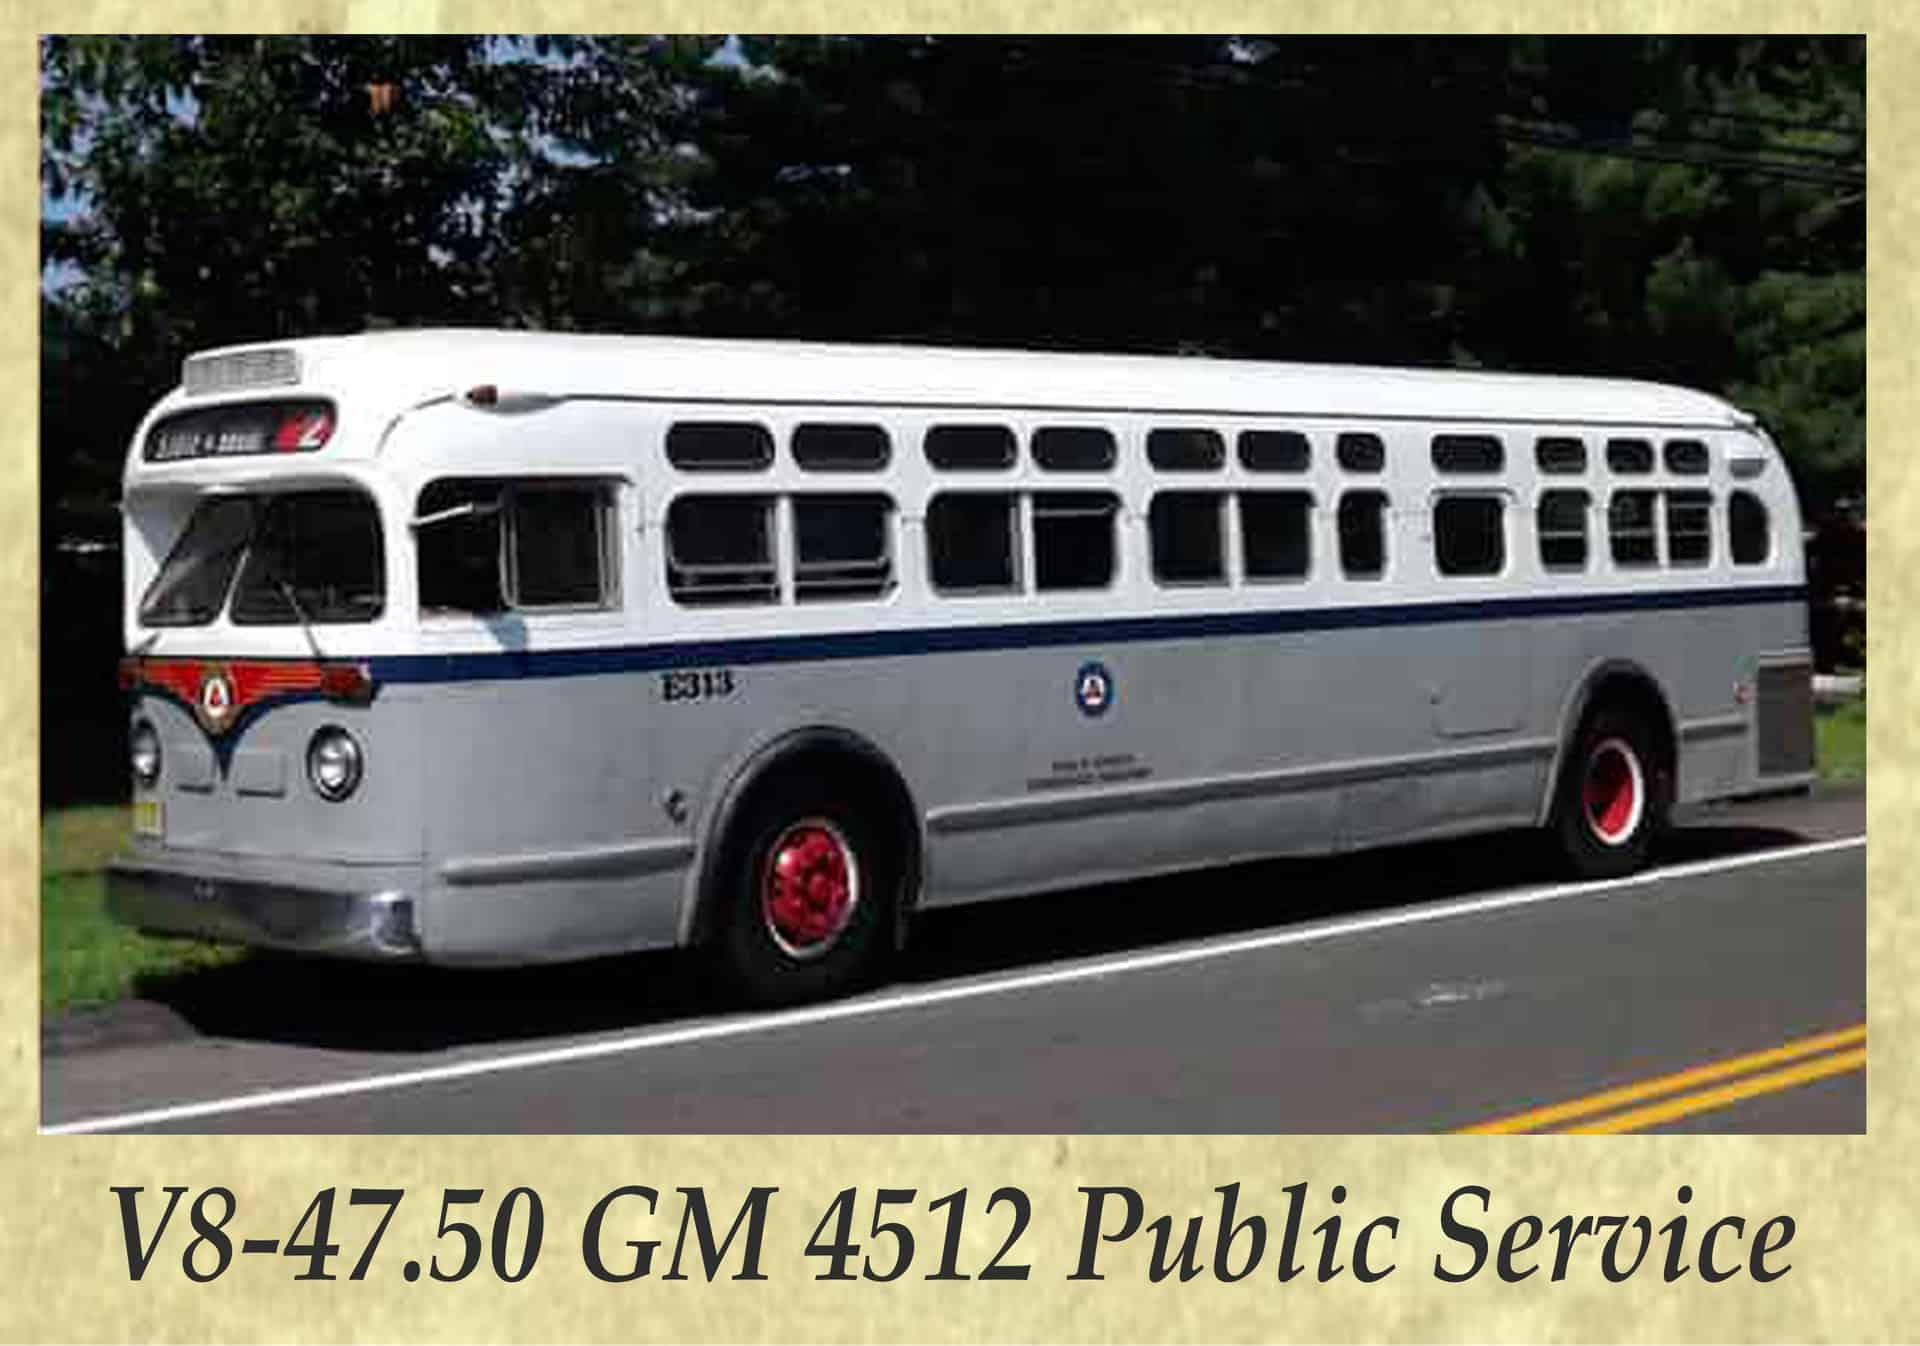 V8-47.50 GM 4512 Public Service